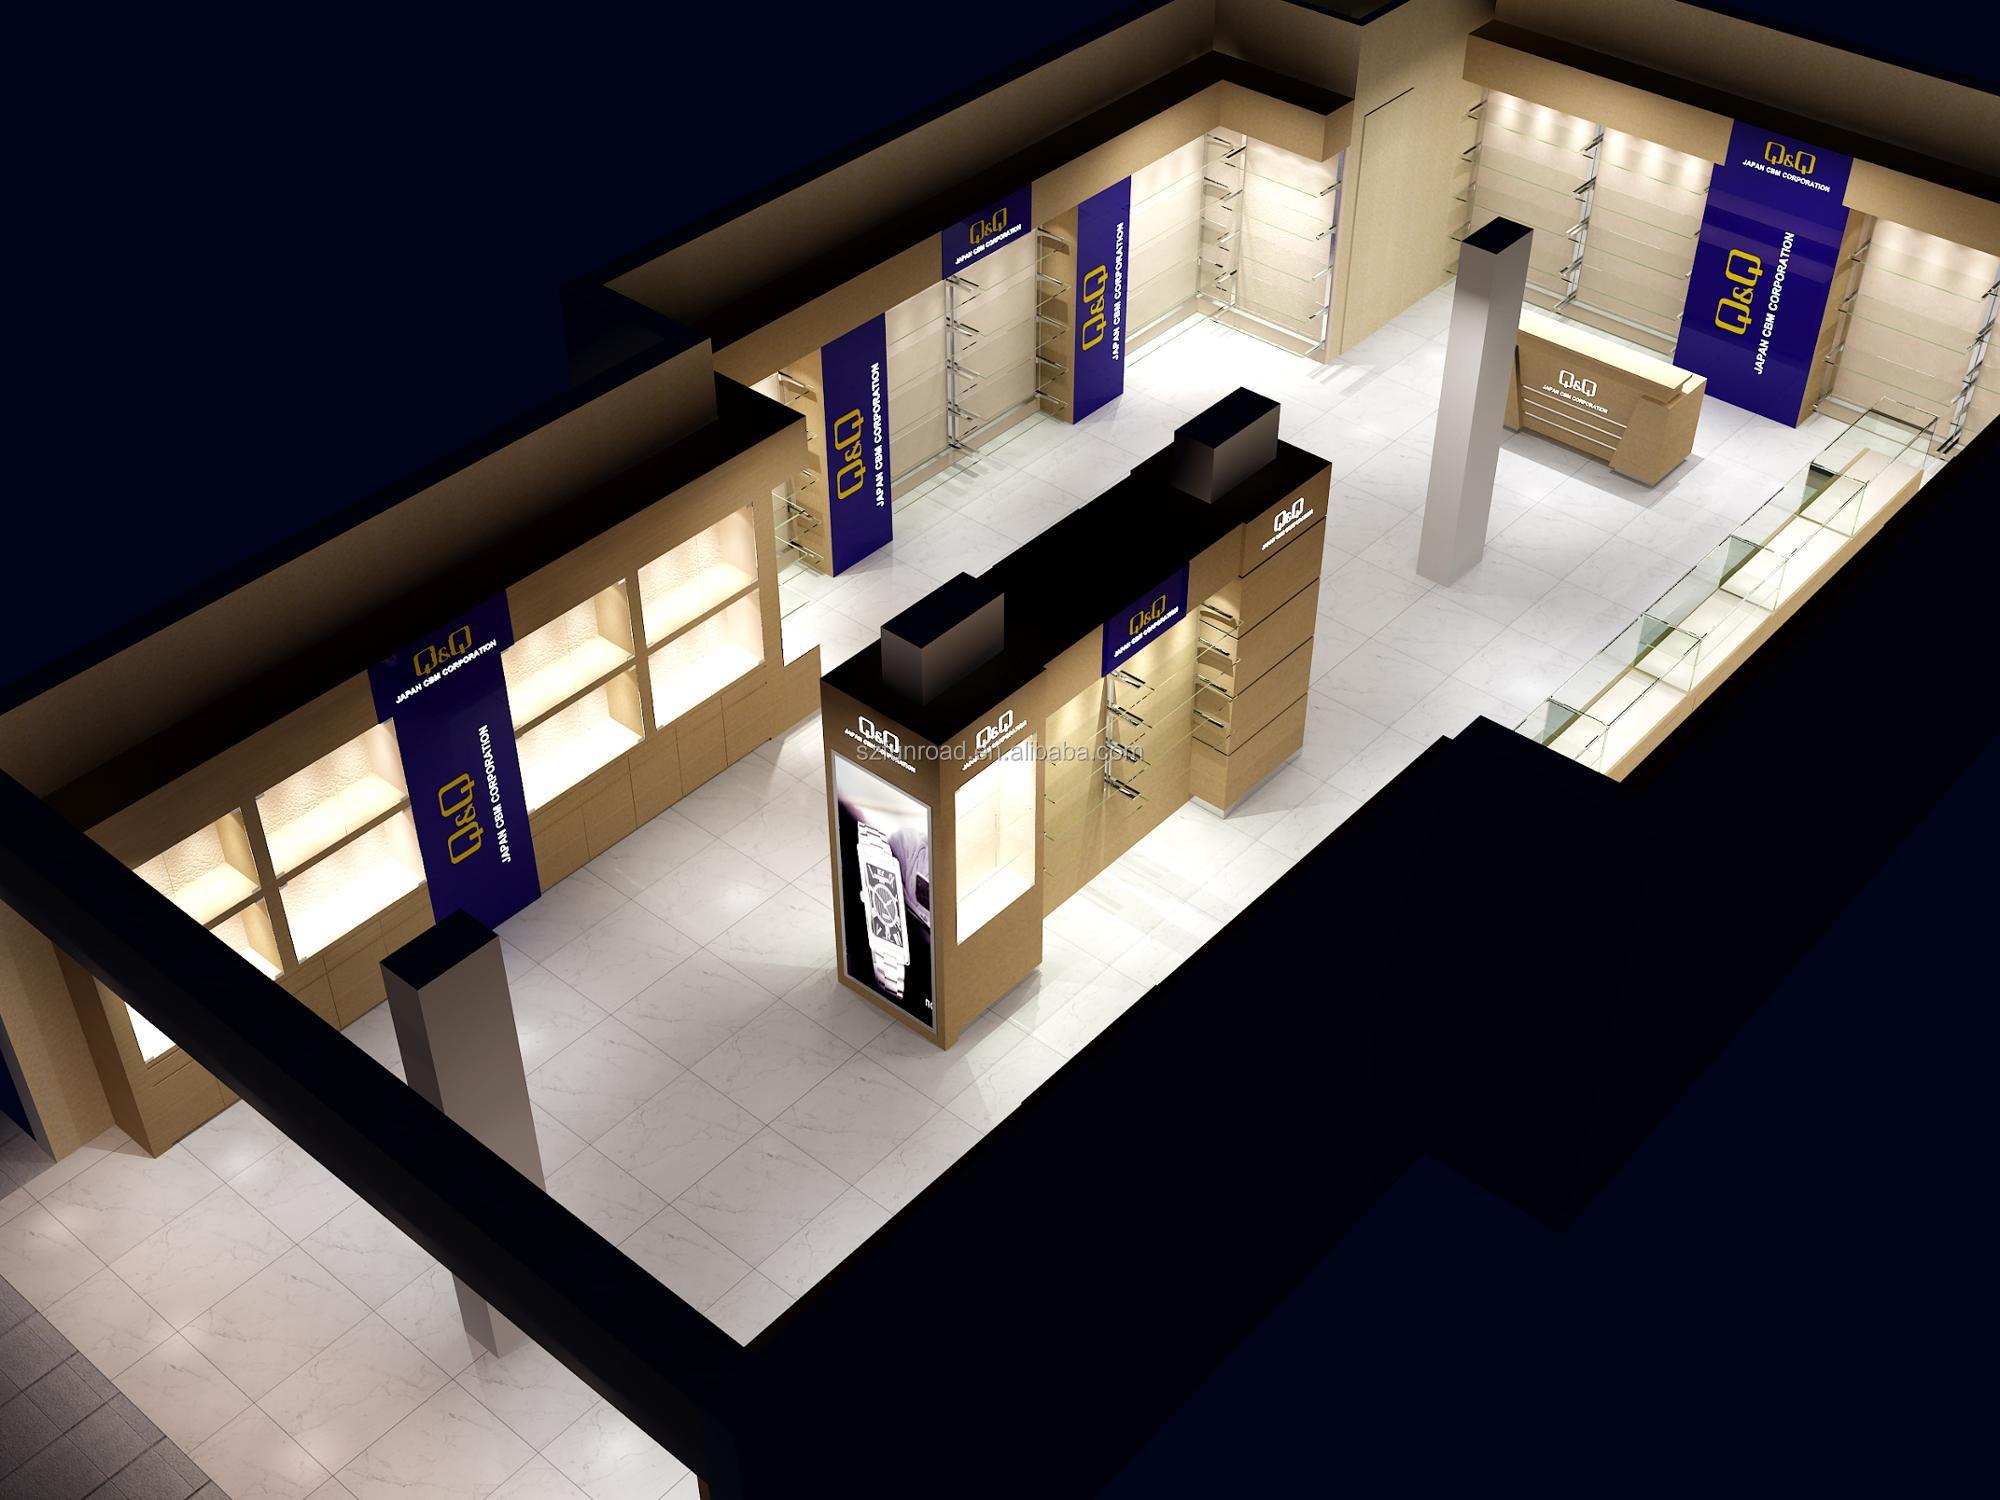 Modern Boutique Watch Store Display Furniture Showroom Interior Design